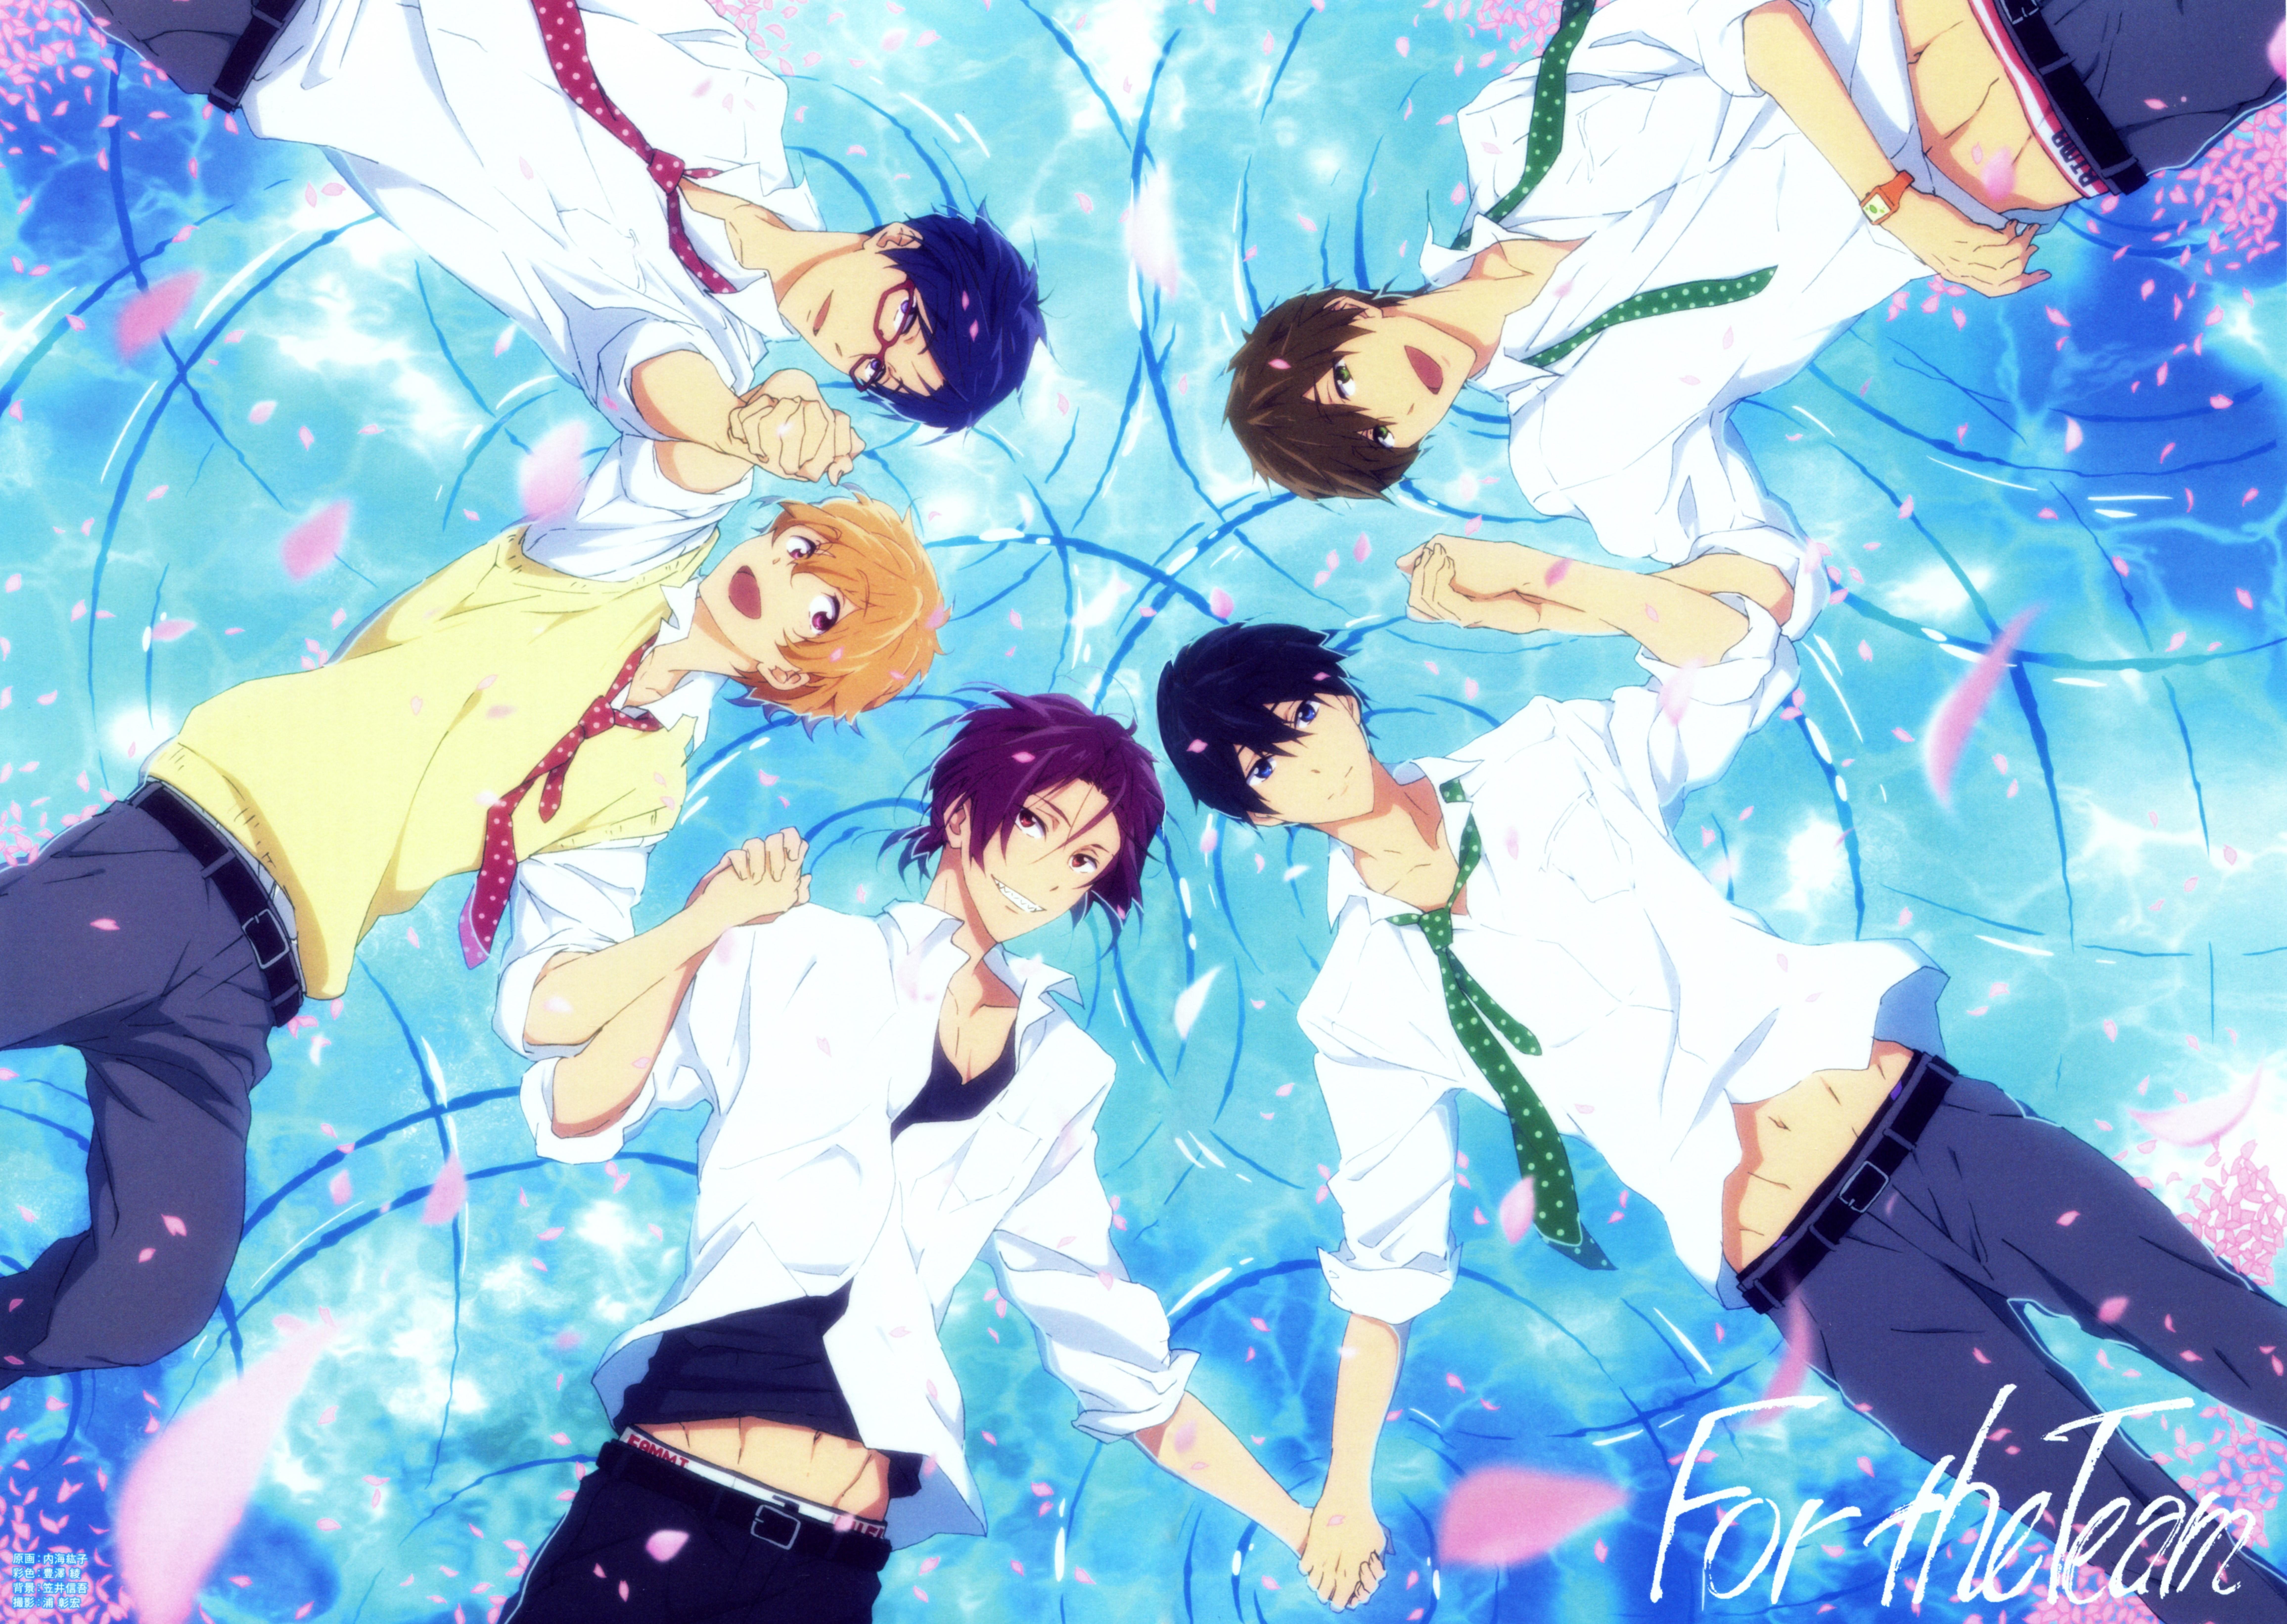 Free zerochan anime image board free download free image voltagebd Choice Image